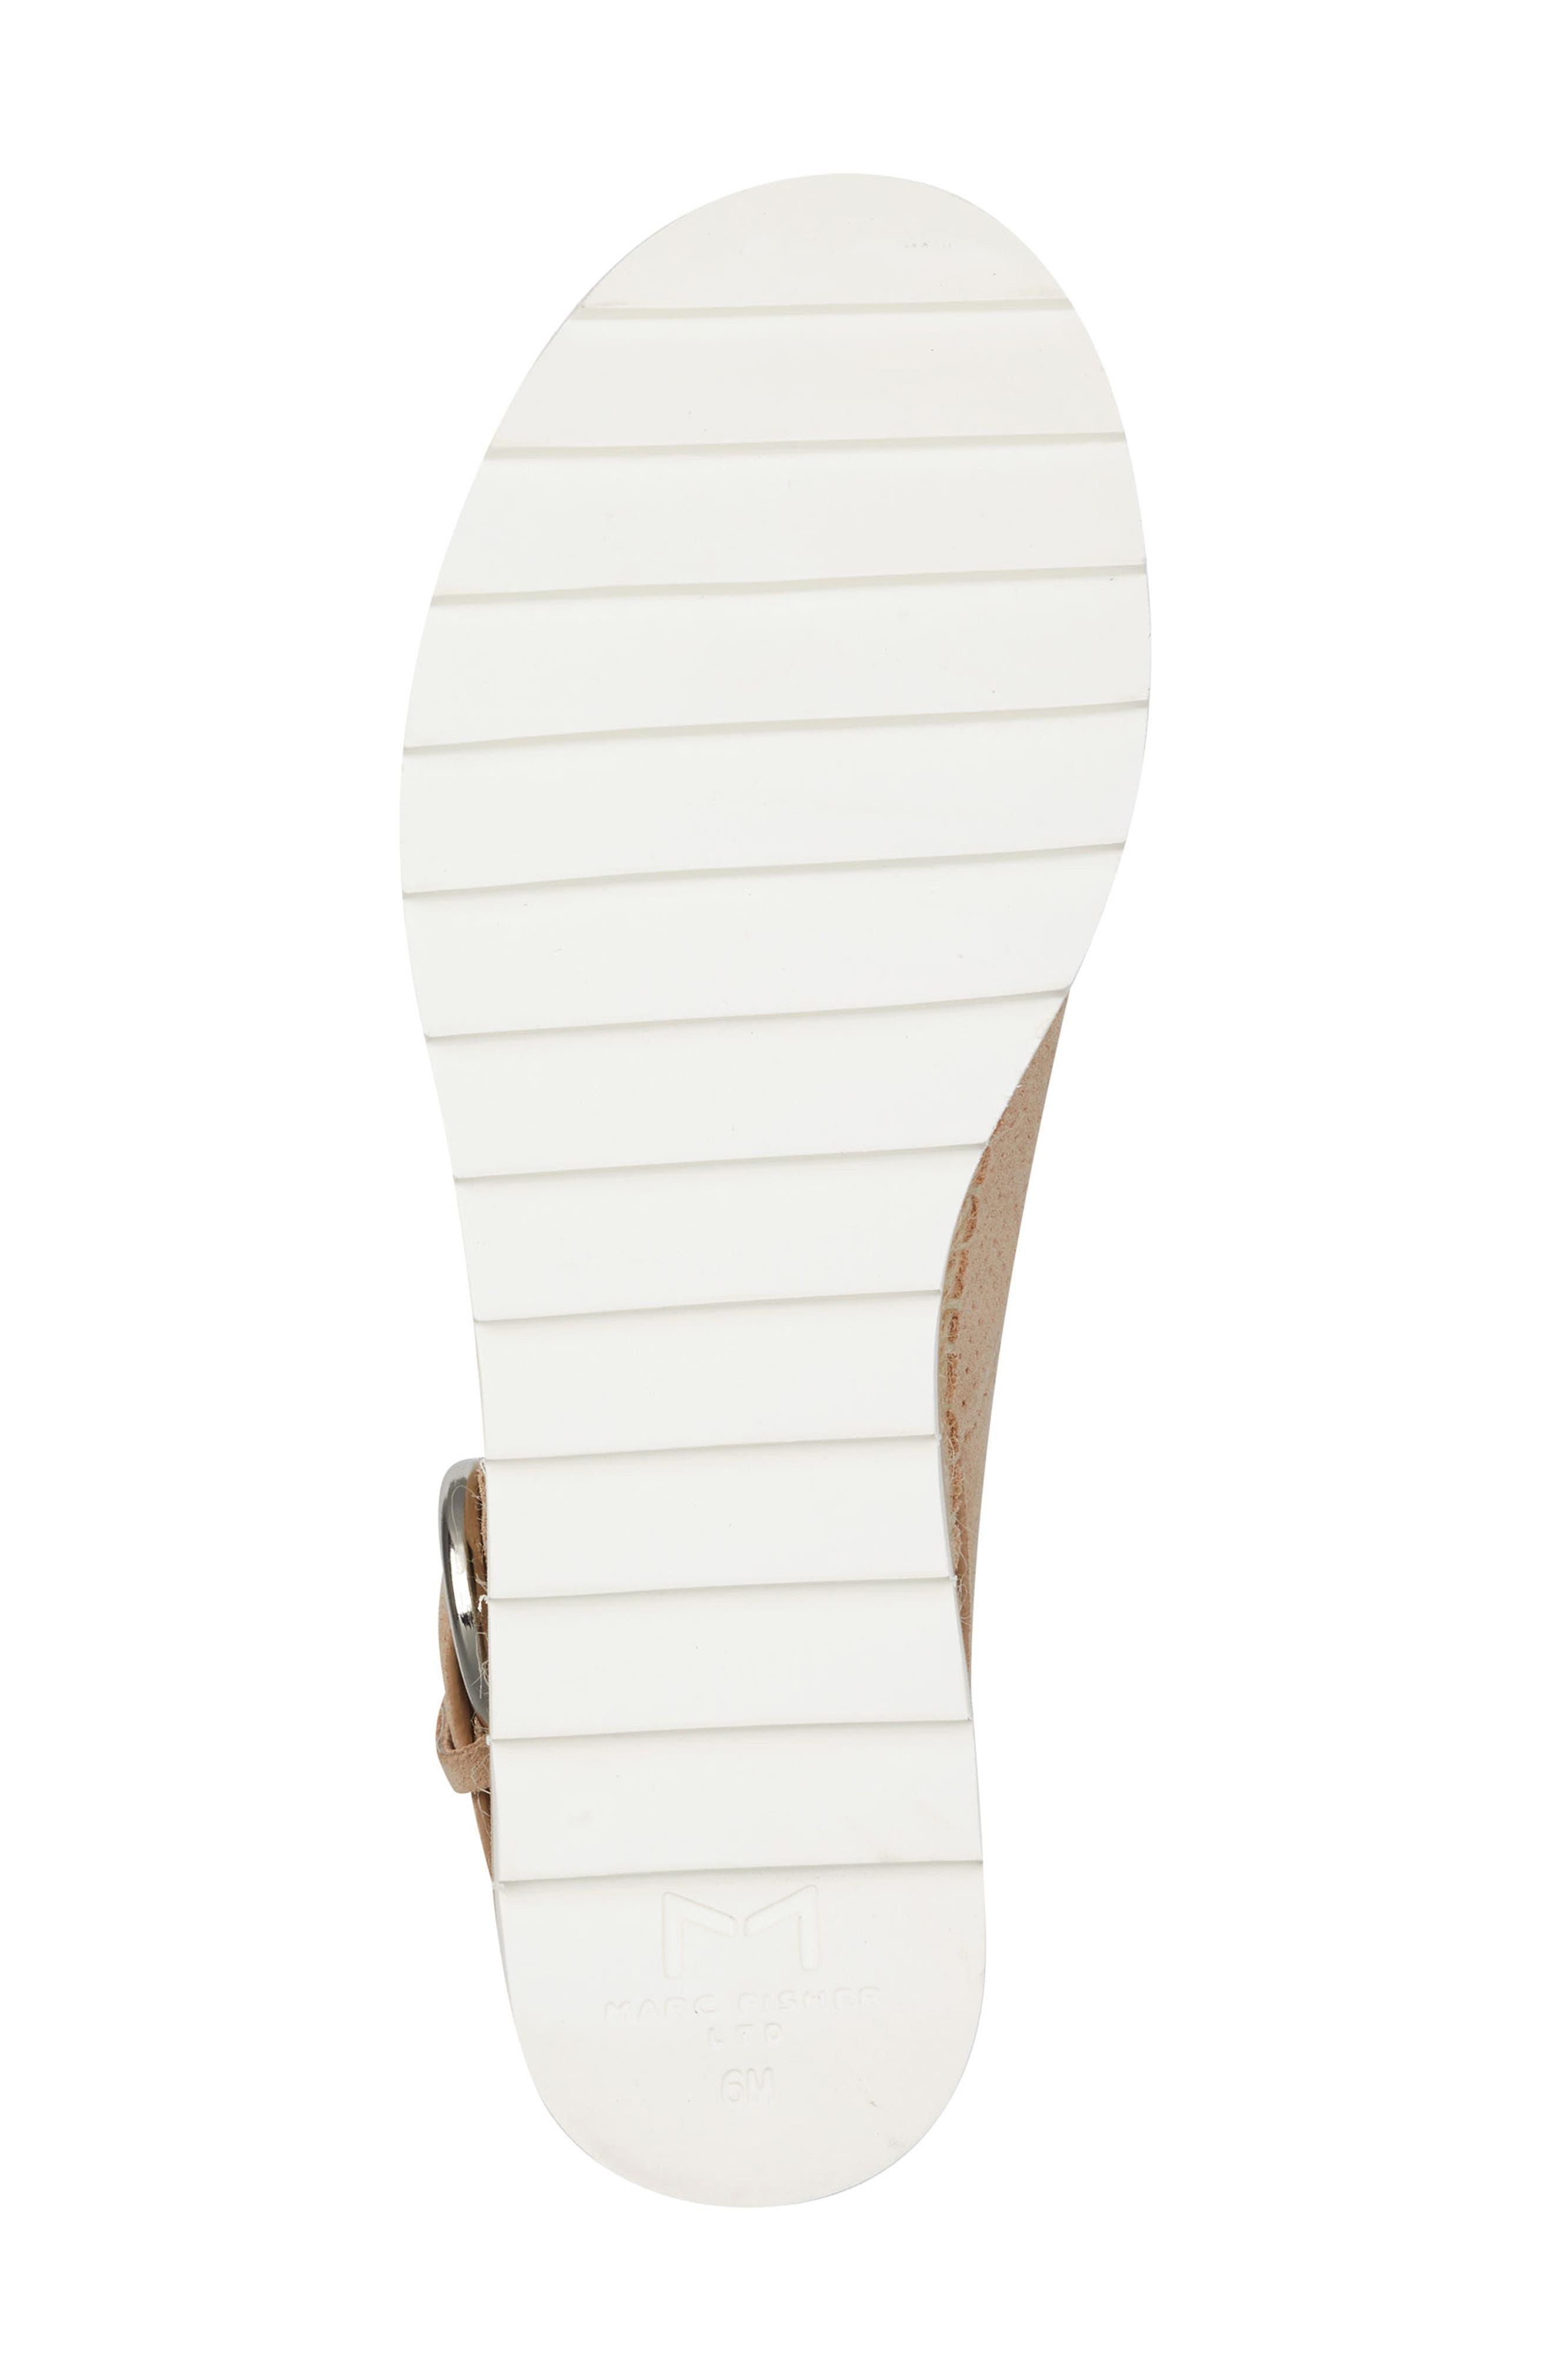 Gellyn Slingback Sandal,                             Alternate thumbnail 6, color,                             LIGHT NATURAL SUEDE